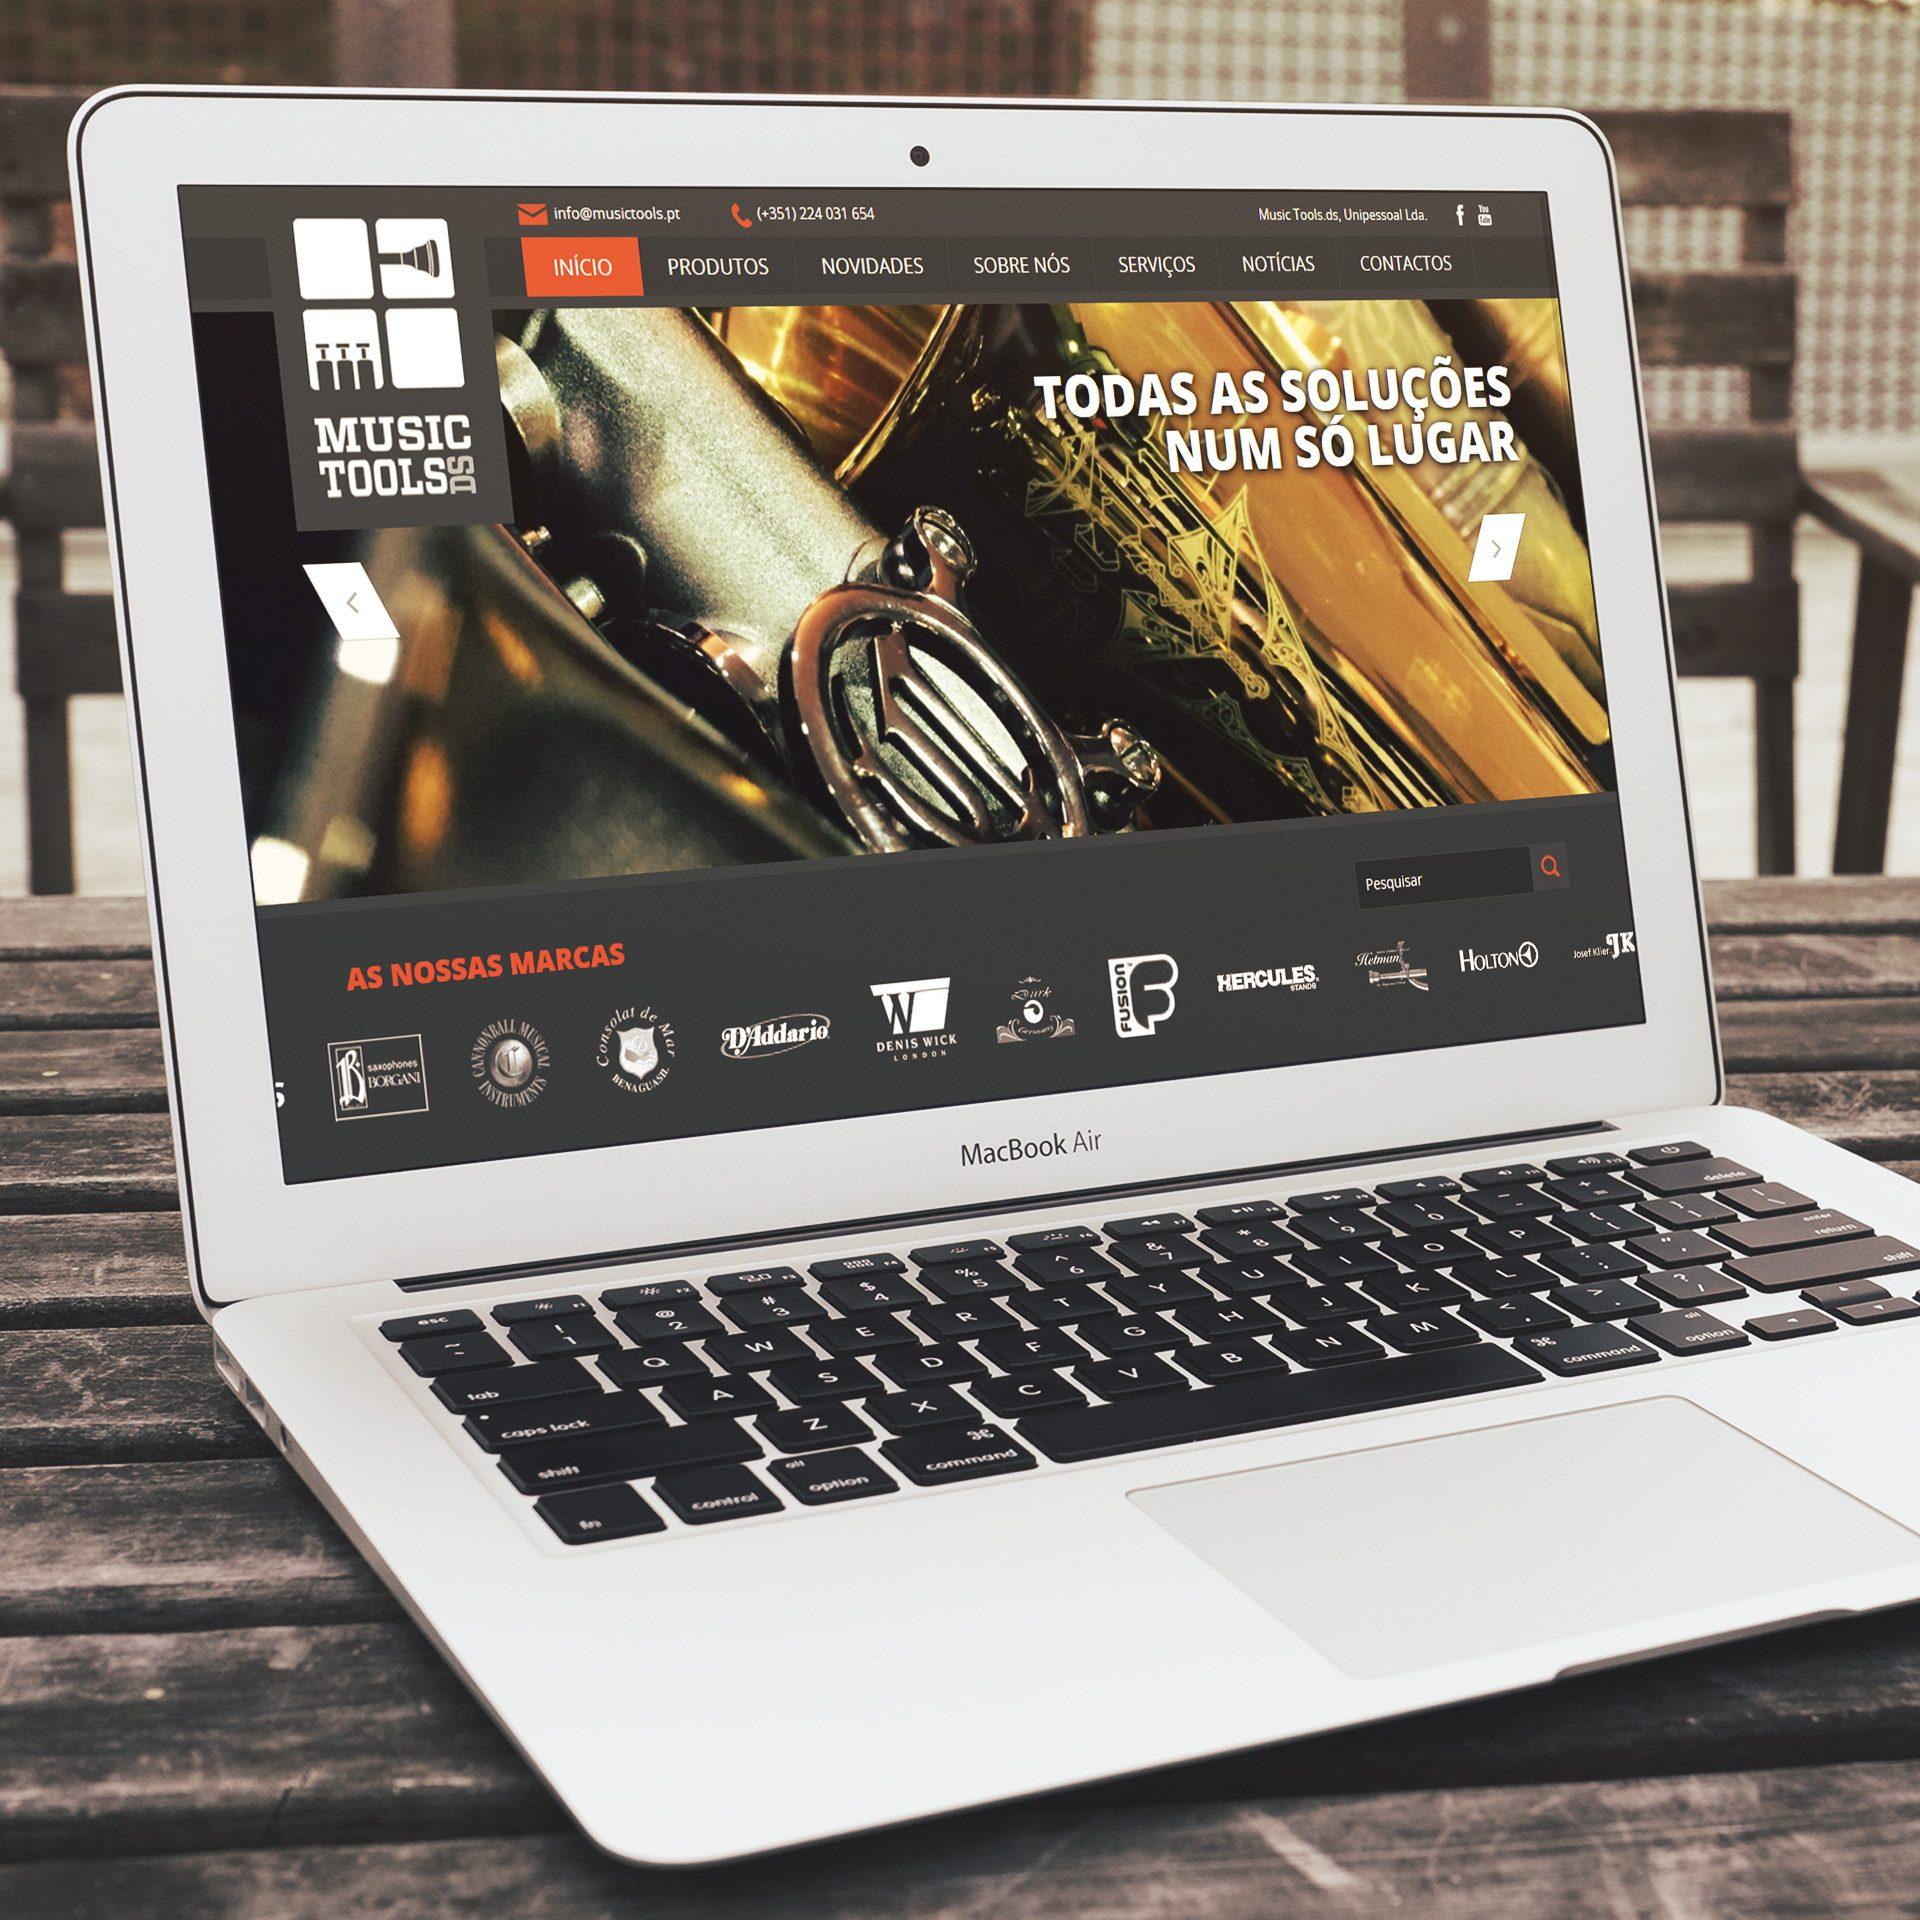 Music Tools DS Loja de Instrumentos de Sopro, Portugal